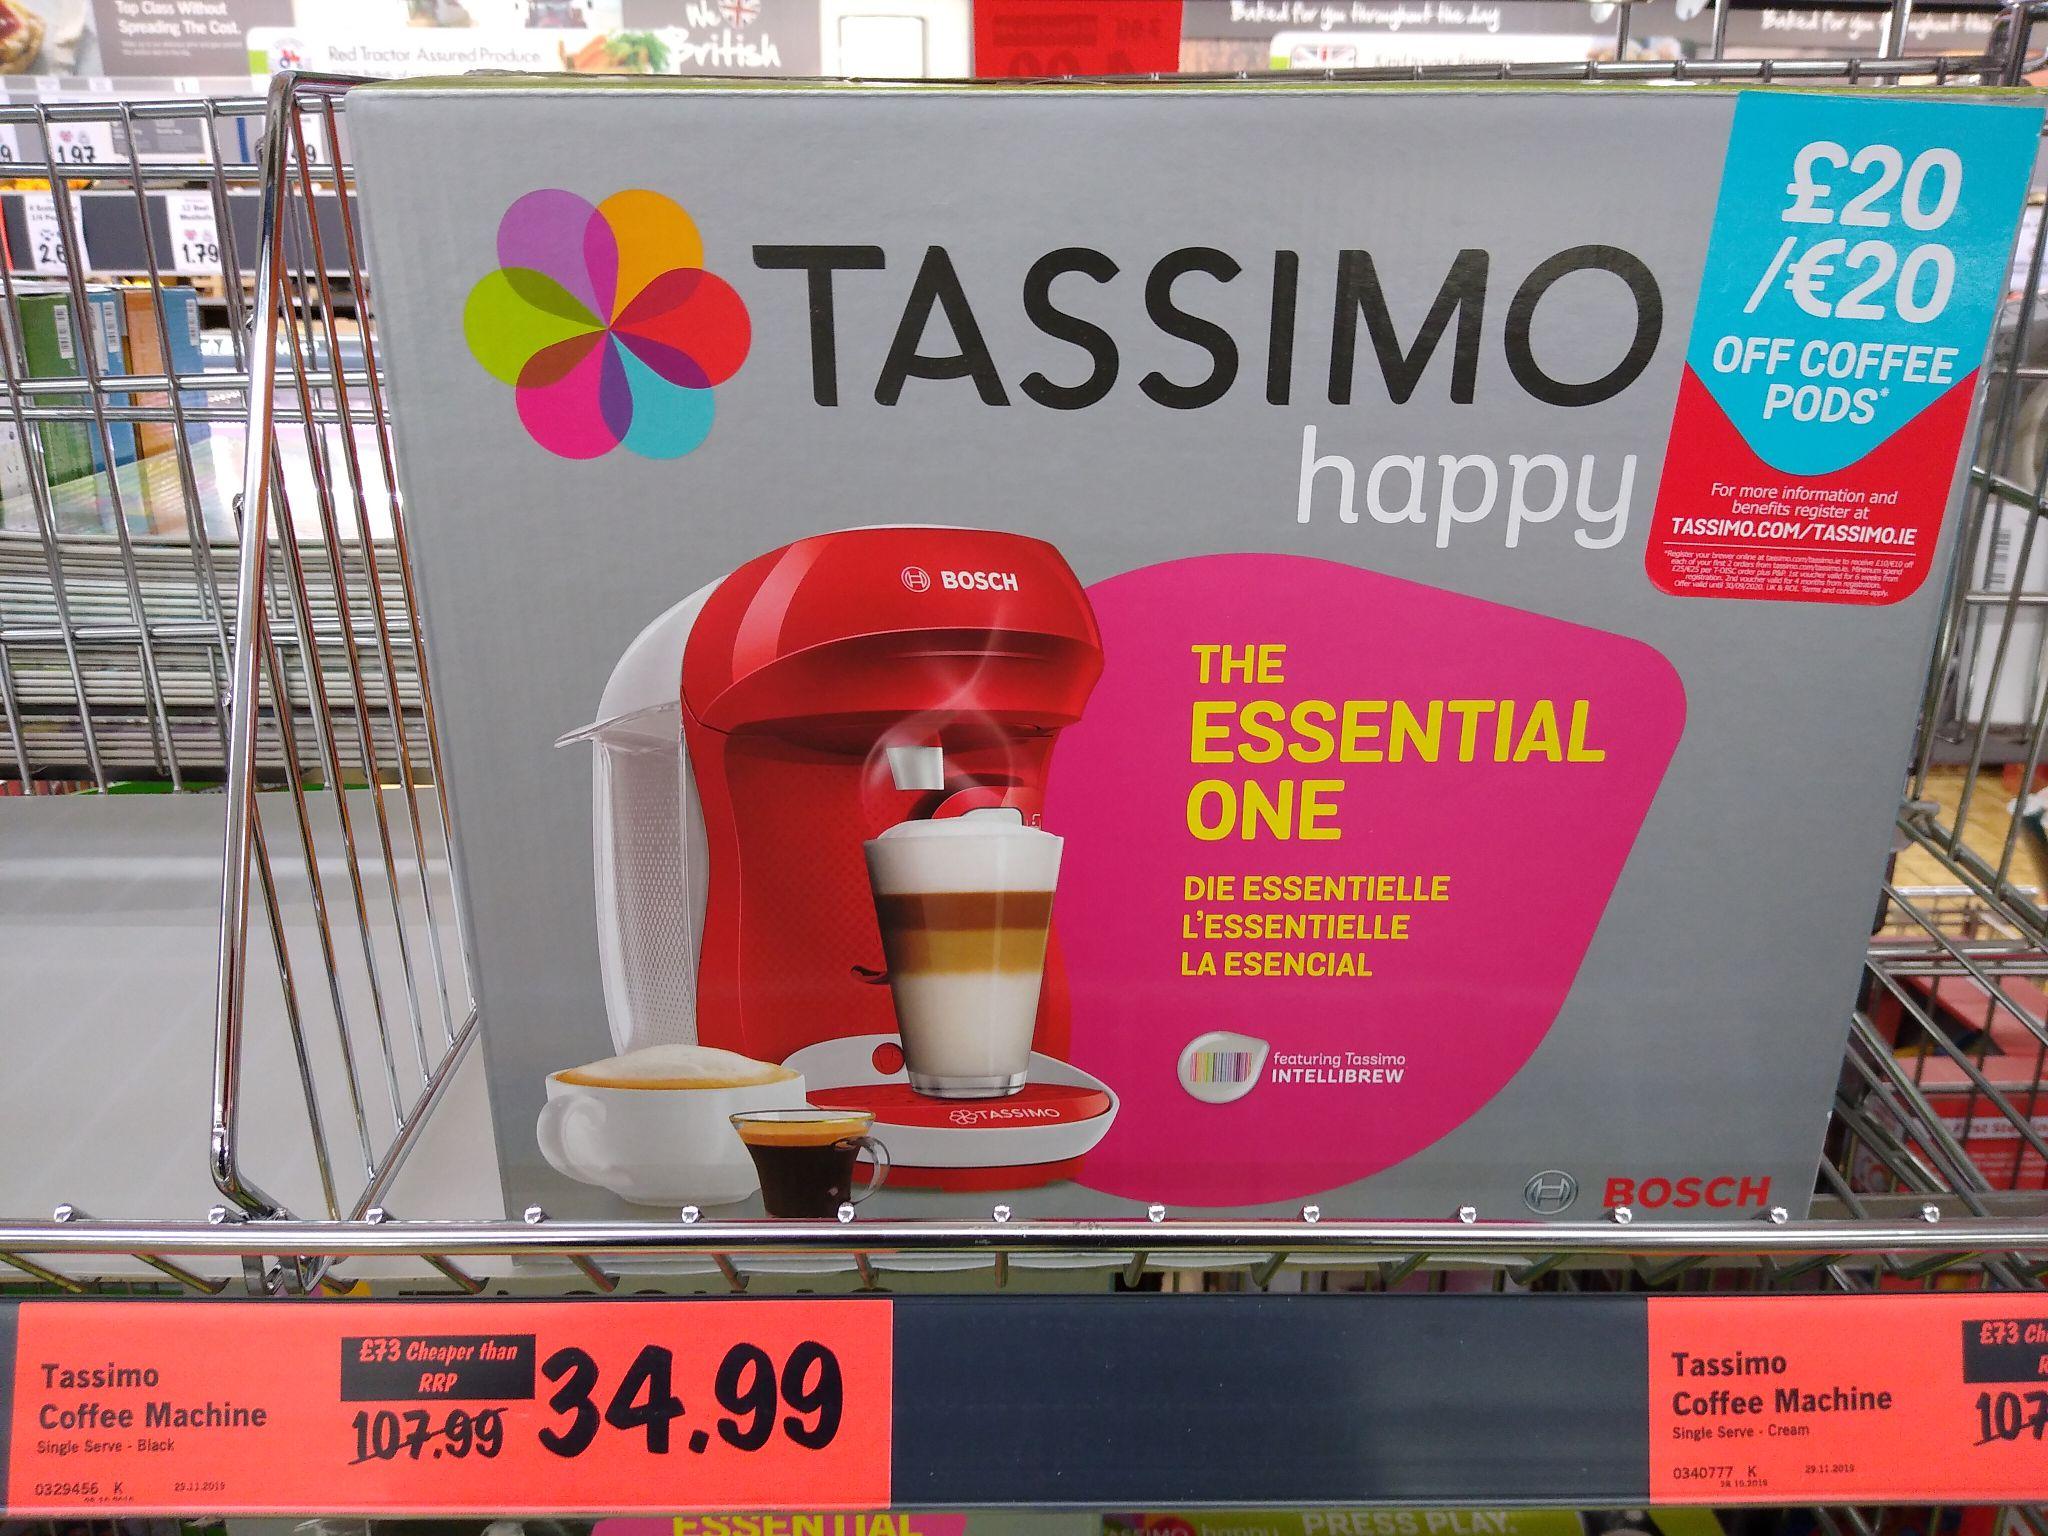 Tassimo coffee machine £34.99 at Lidl (Sidcup)